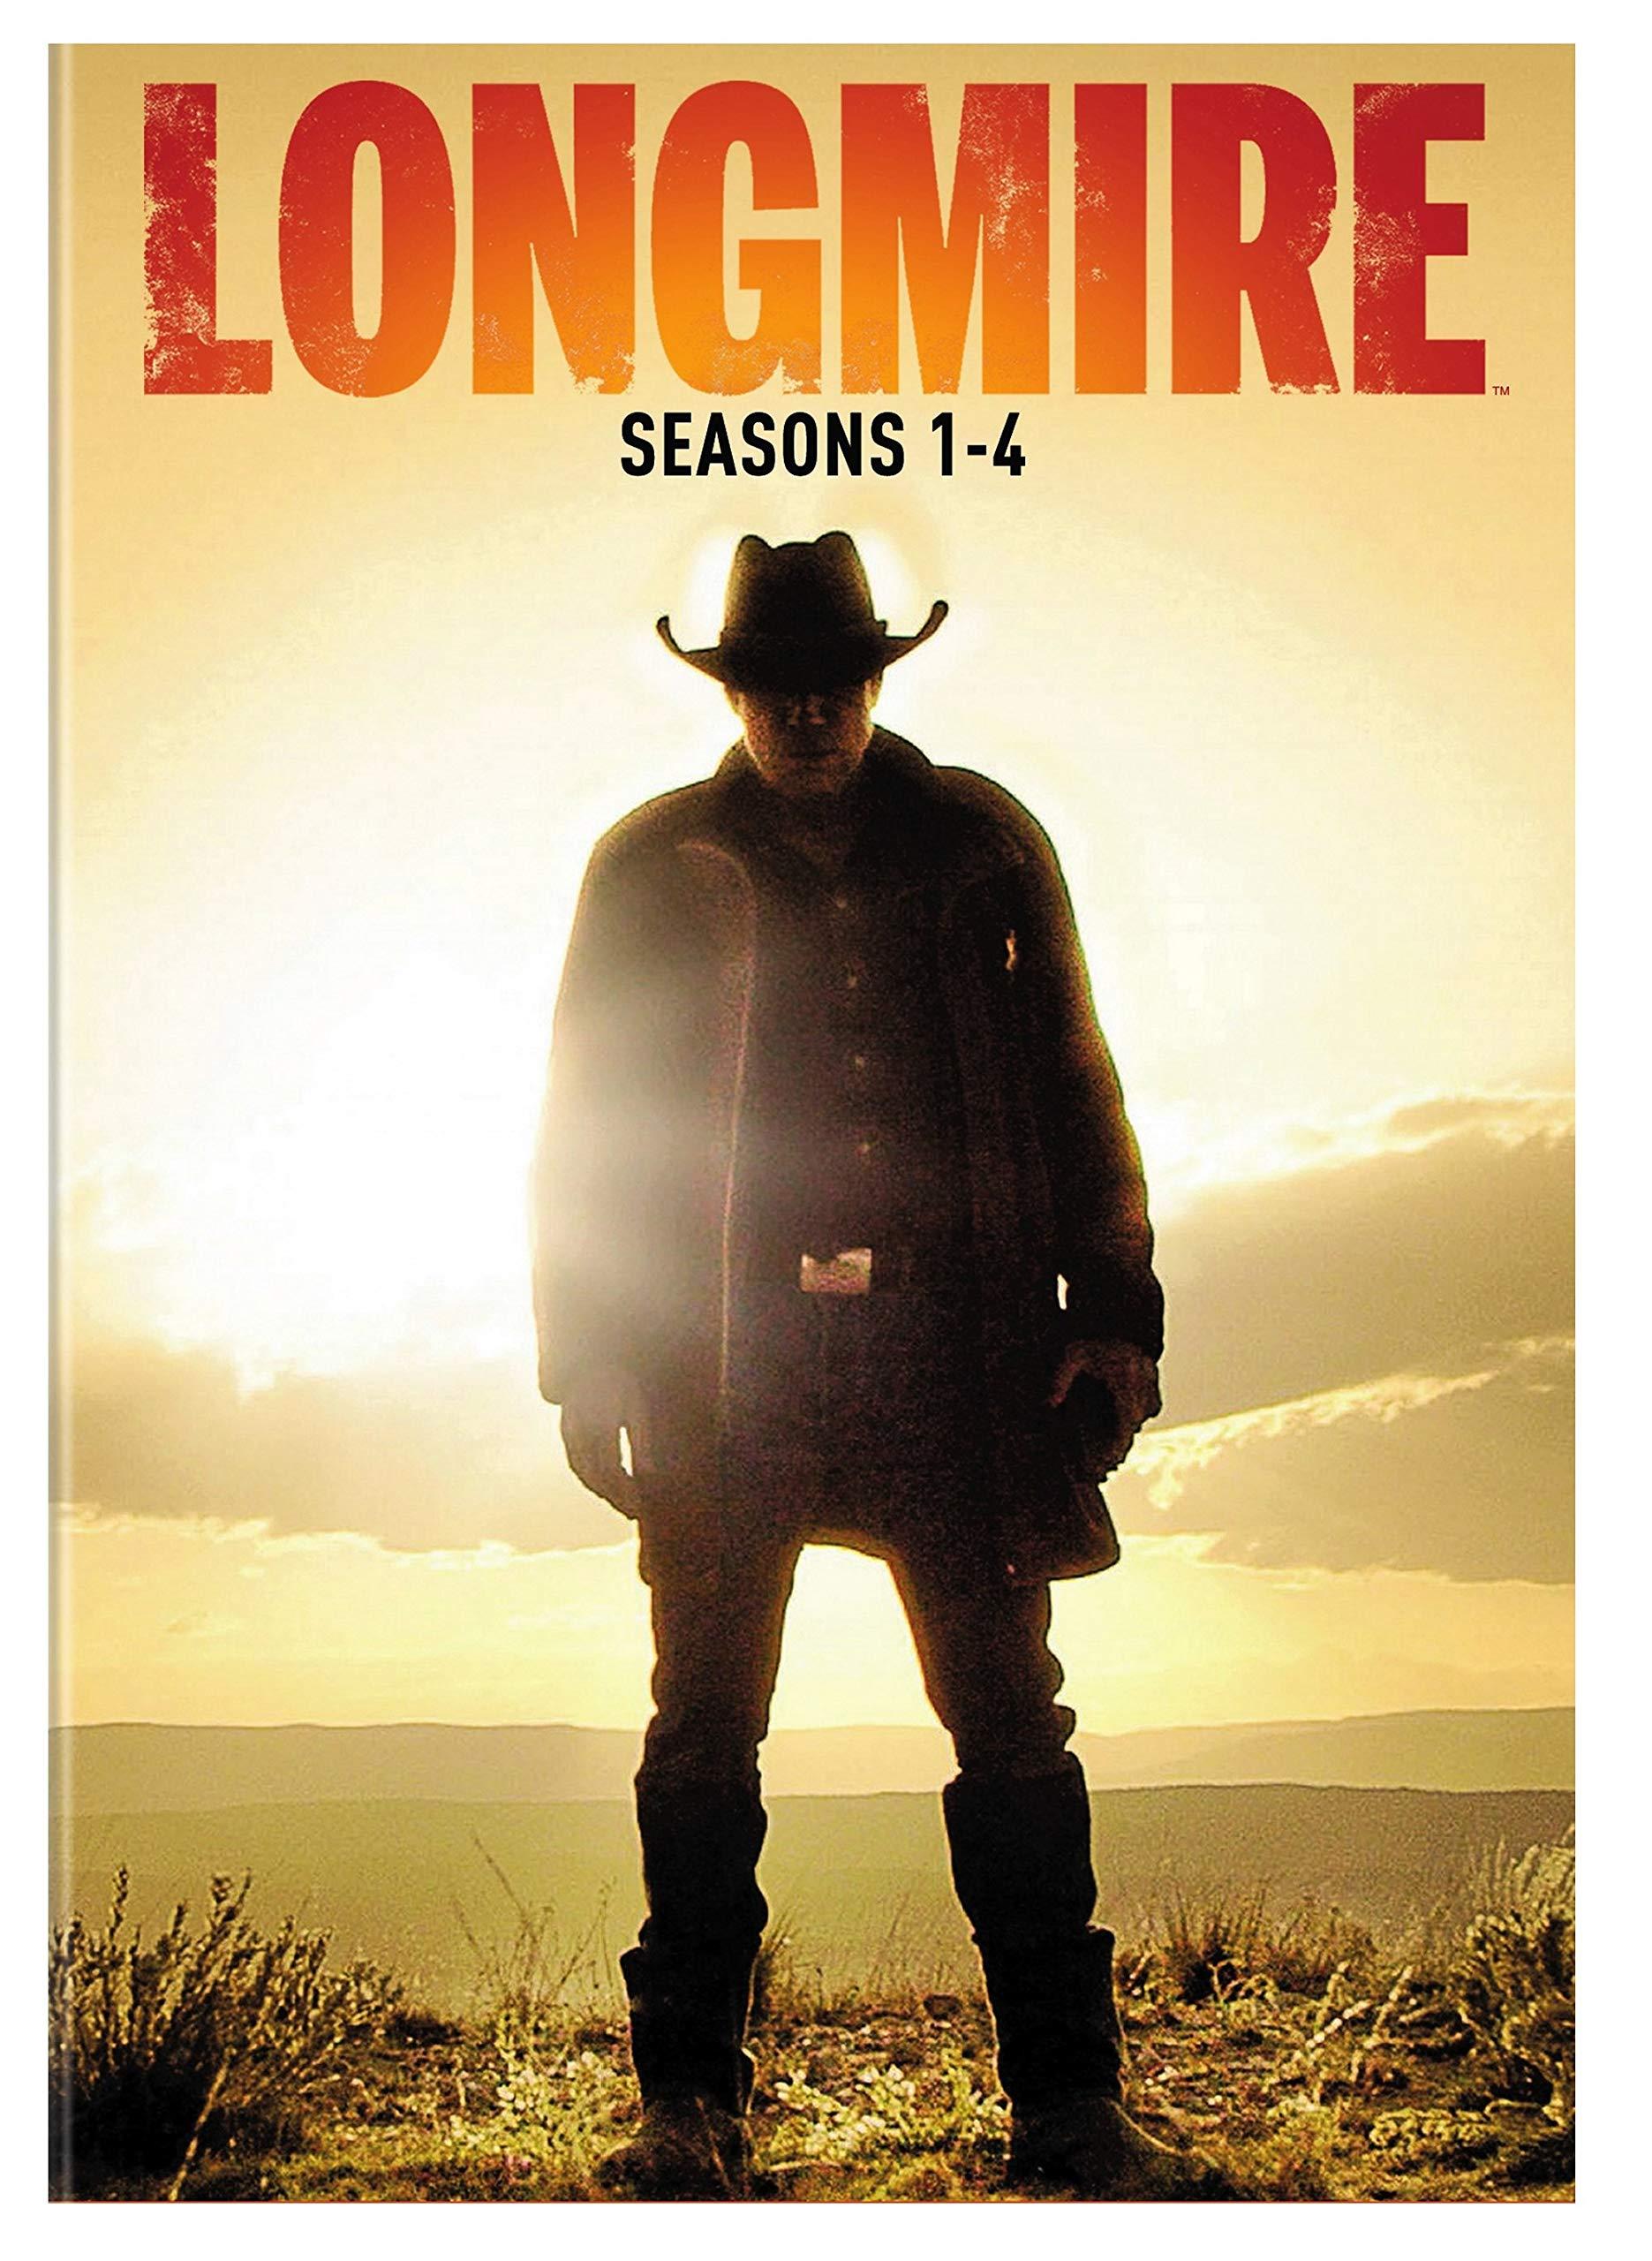 DVD : Longmire: Seasons 1-4 (Boxed Set)